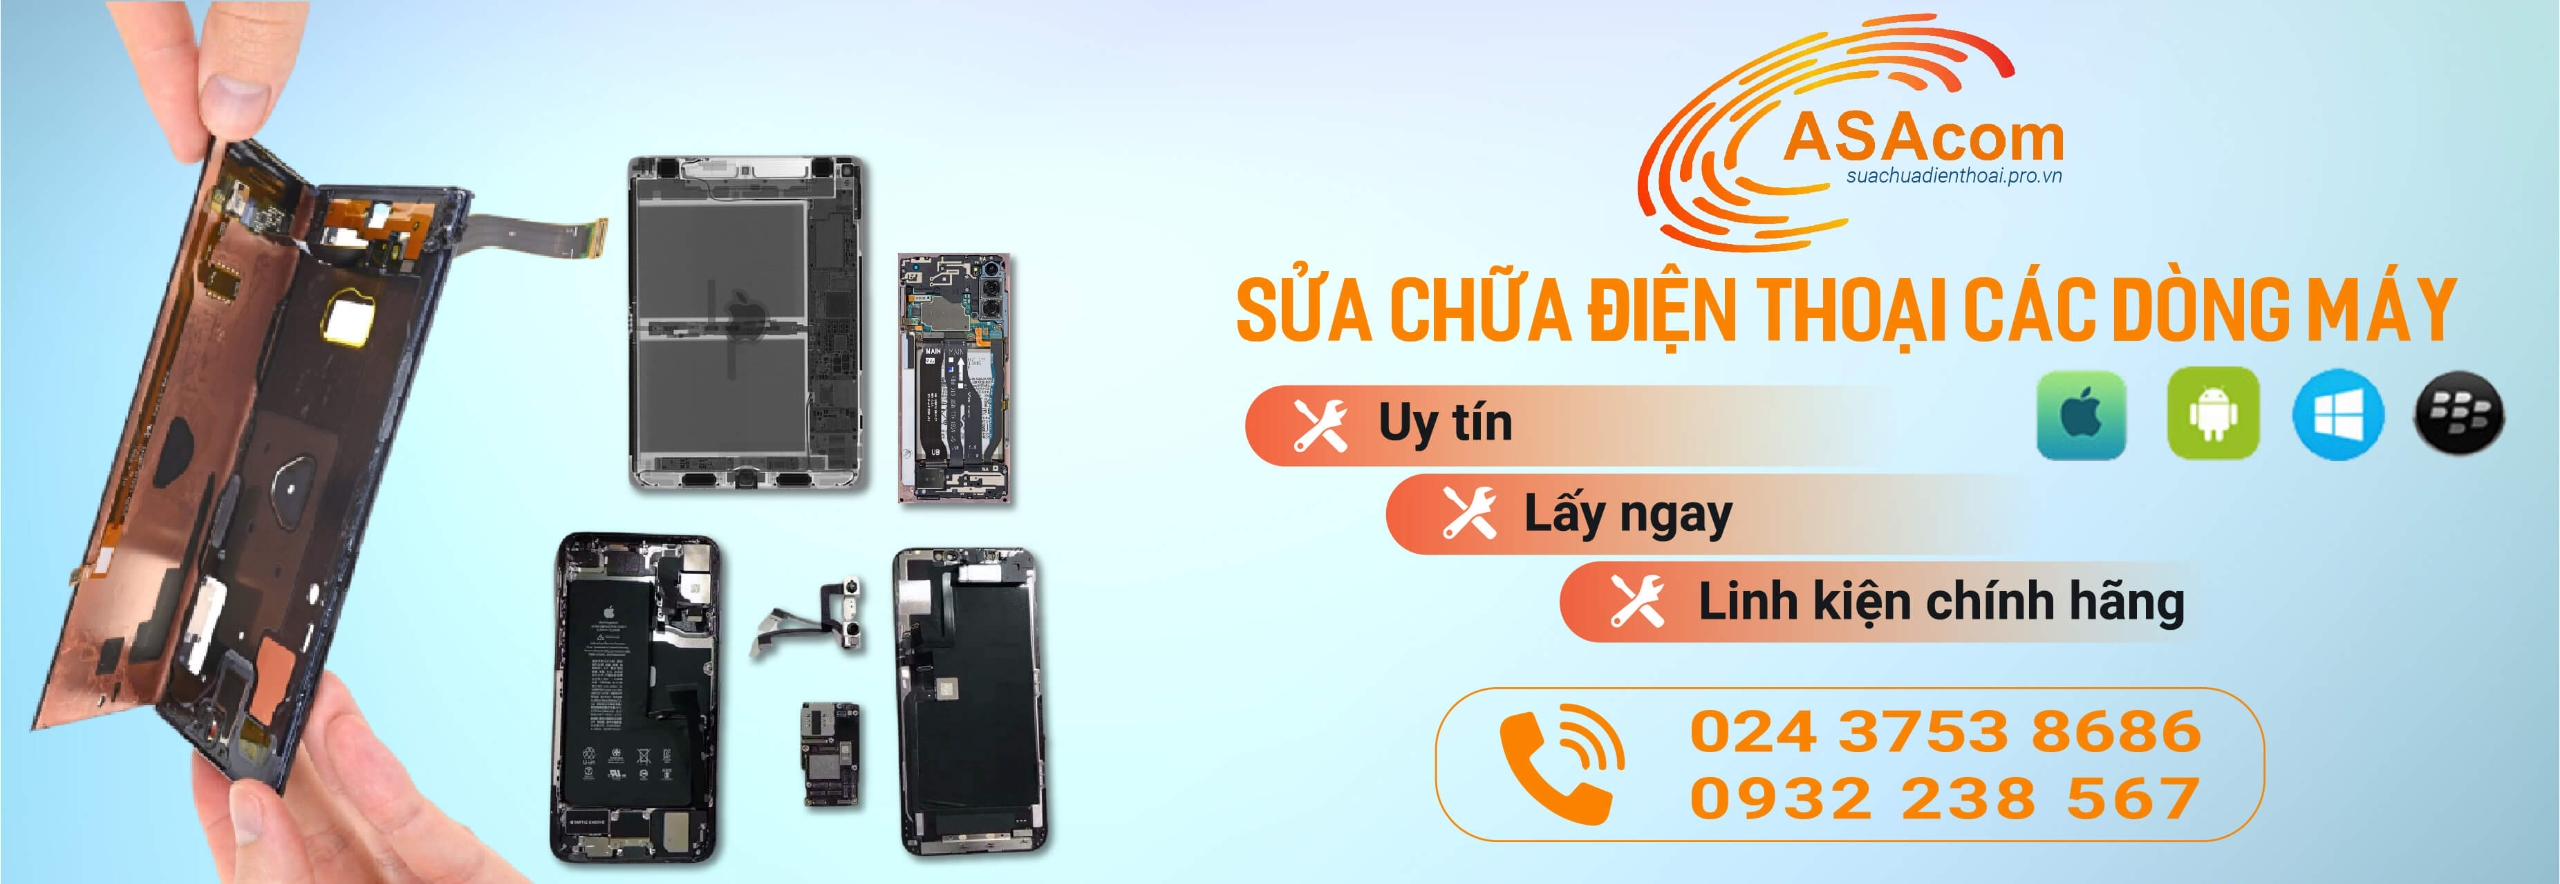 Sửa Iphone (@suaiphone125) Cover Image